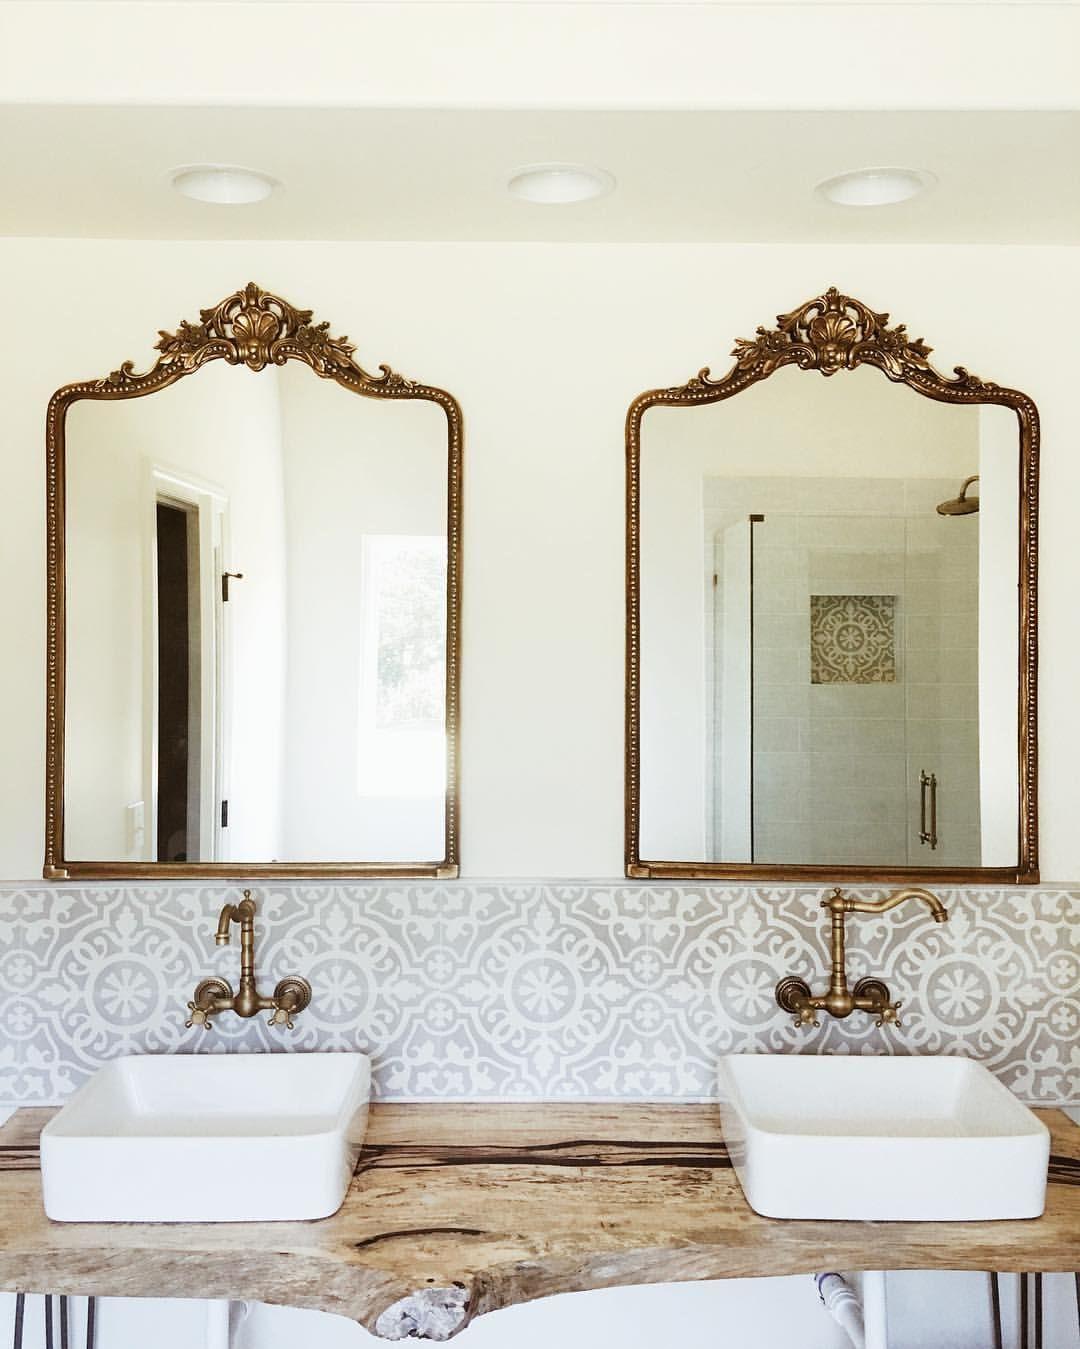 Guest 1 2 Bathroom Ideas: Pin By My Vintage Porch On Bathrooms